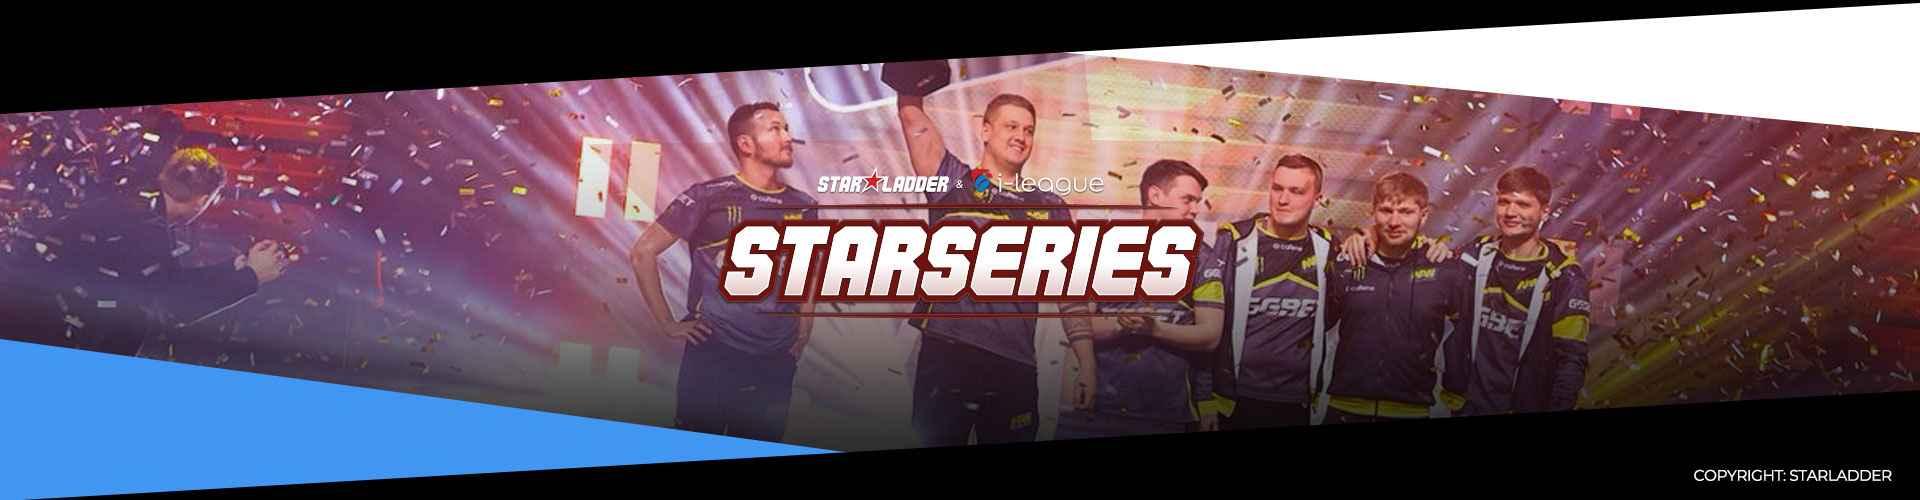 Counter-Strike: Global Offensive - Starseries Season 7